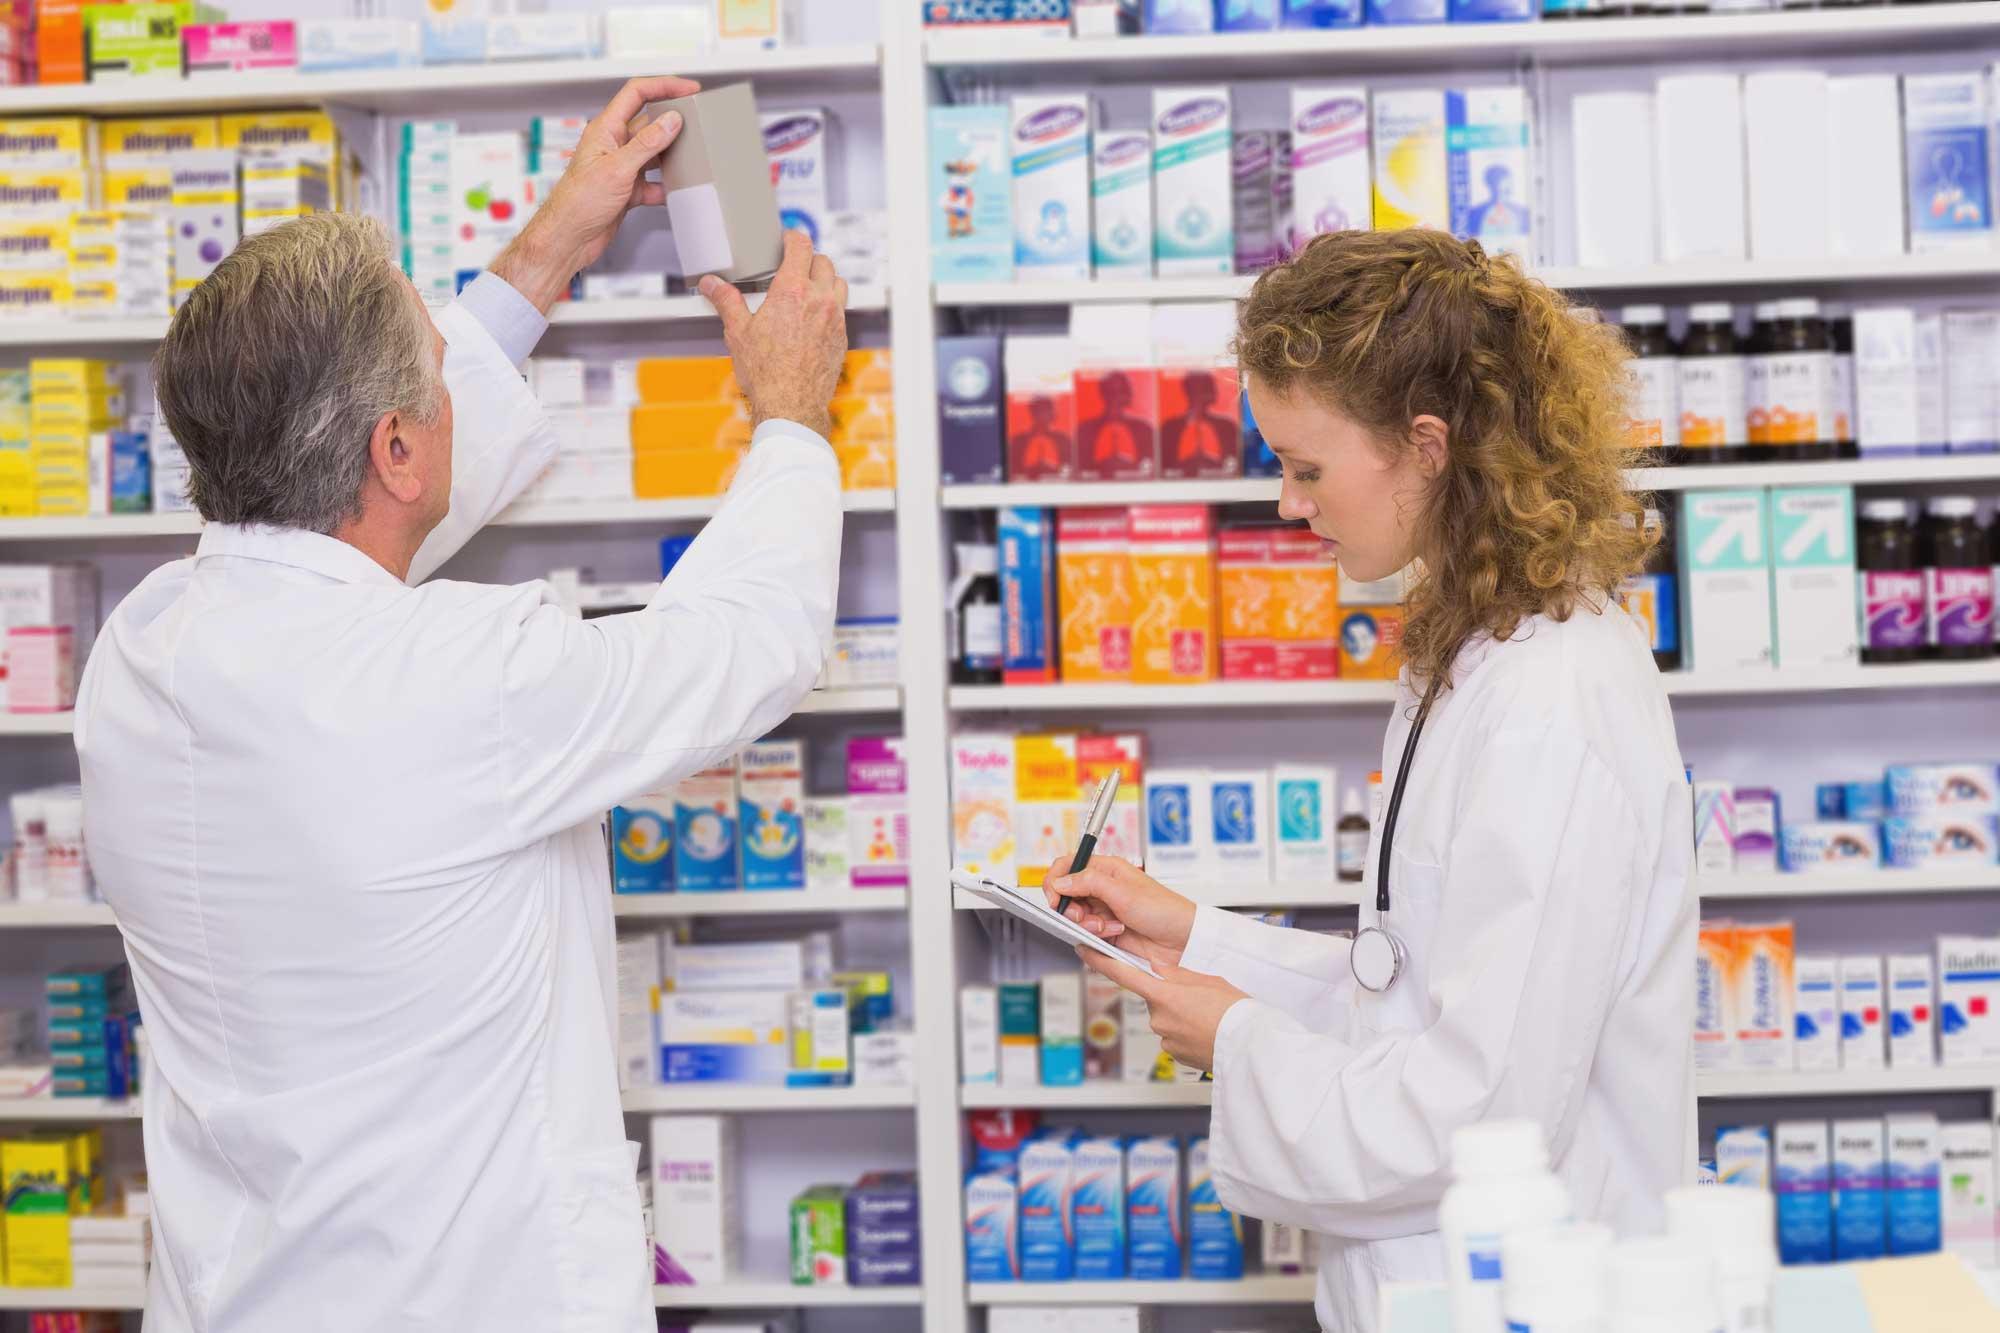 Аптеки в япония - каталог - список - руководство - pharmaciesworldwide